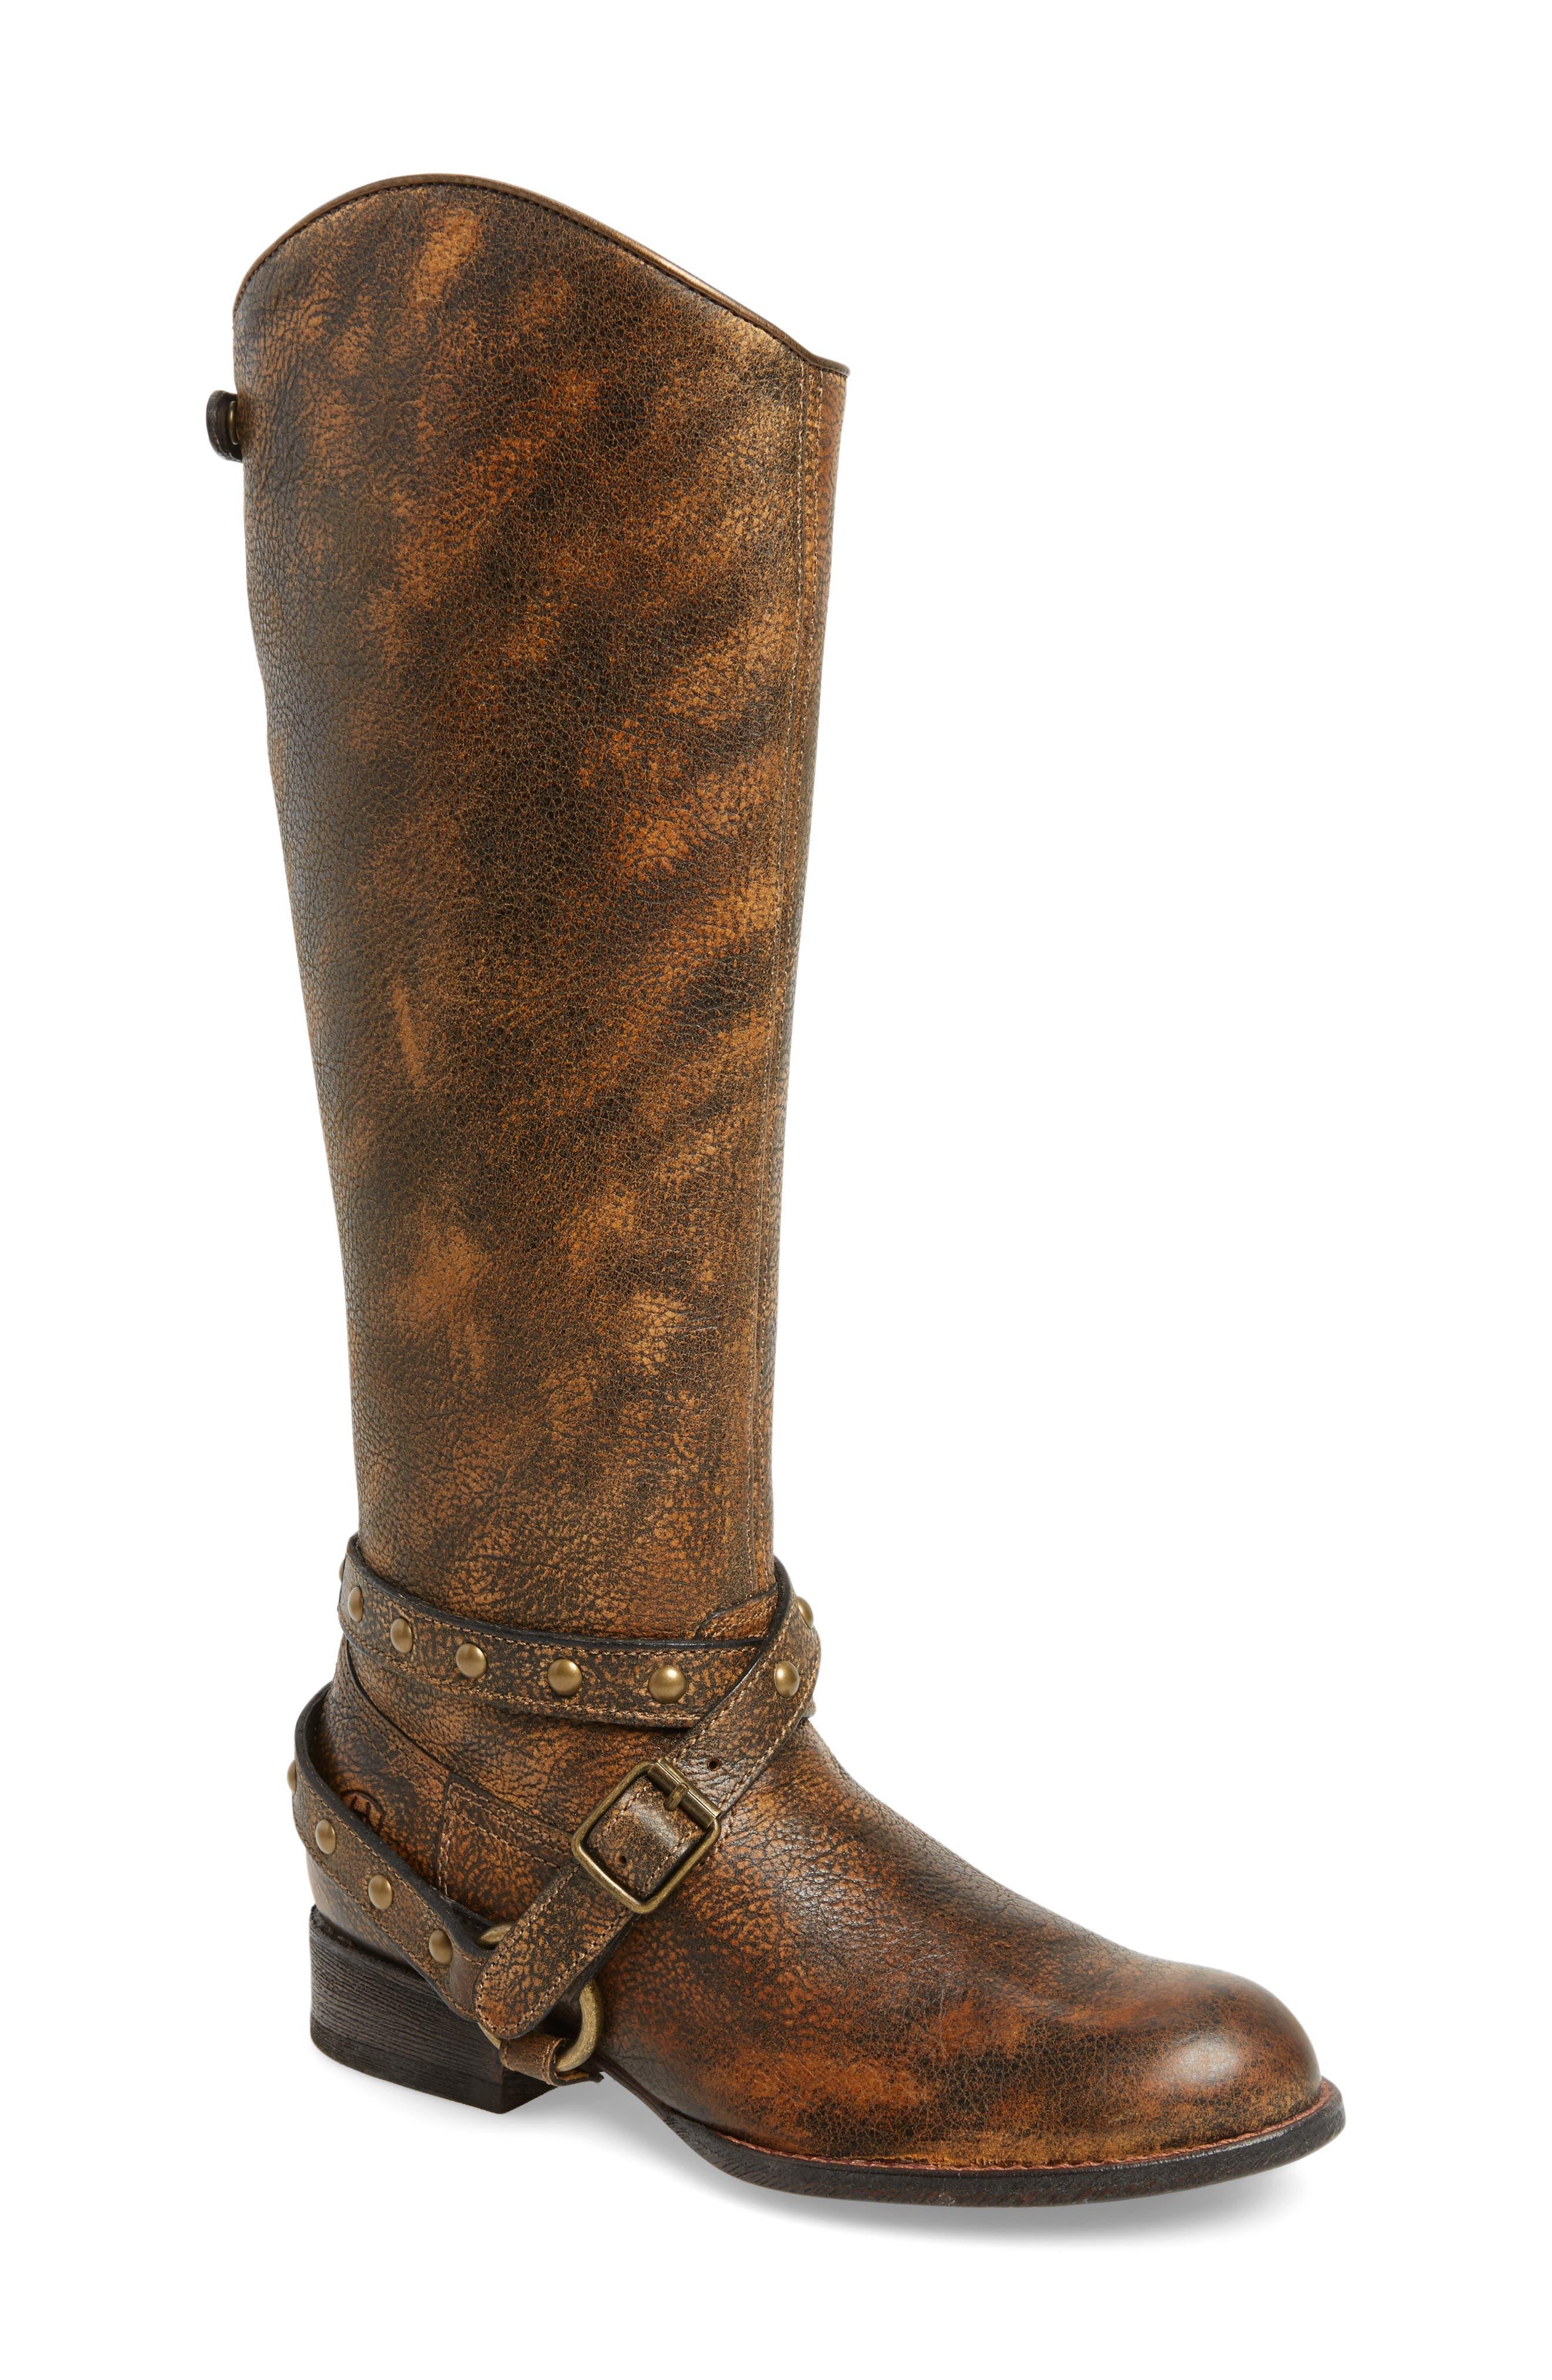 Alternate Image 1 Selected - Ariat Manhattan Western Boot (Women)